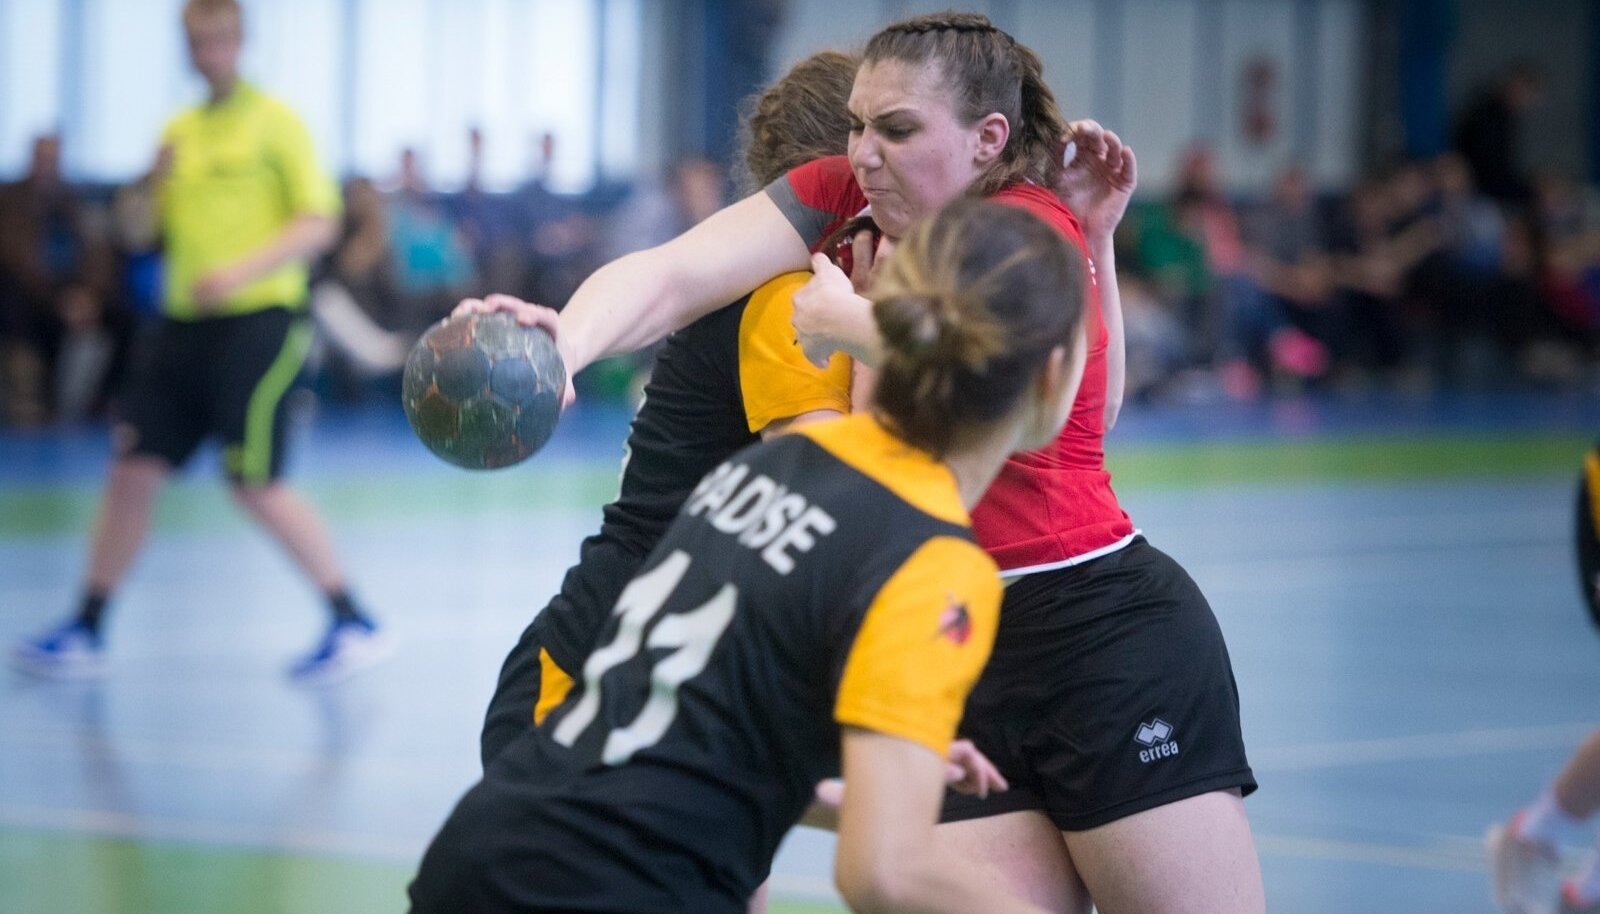 Eesti naiste käsipalliliiga. (Foto on illustratiivne)